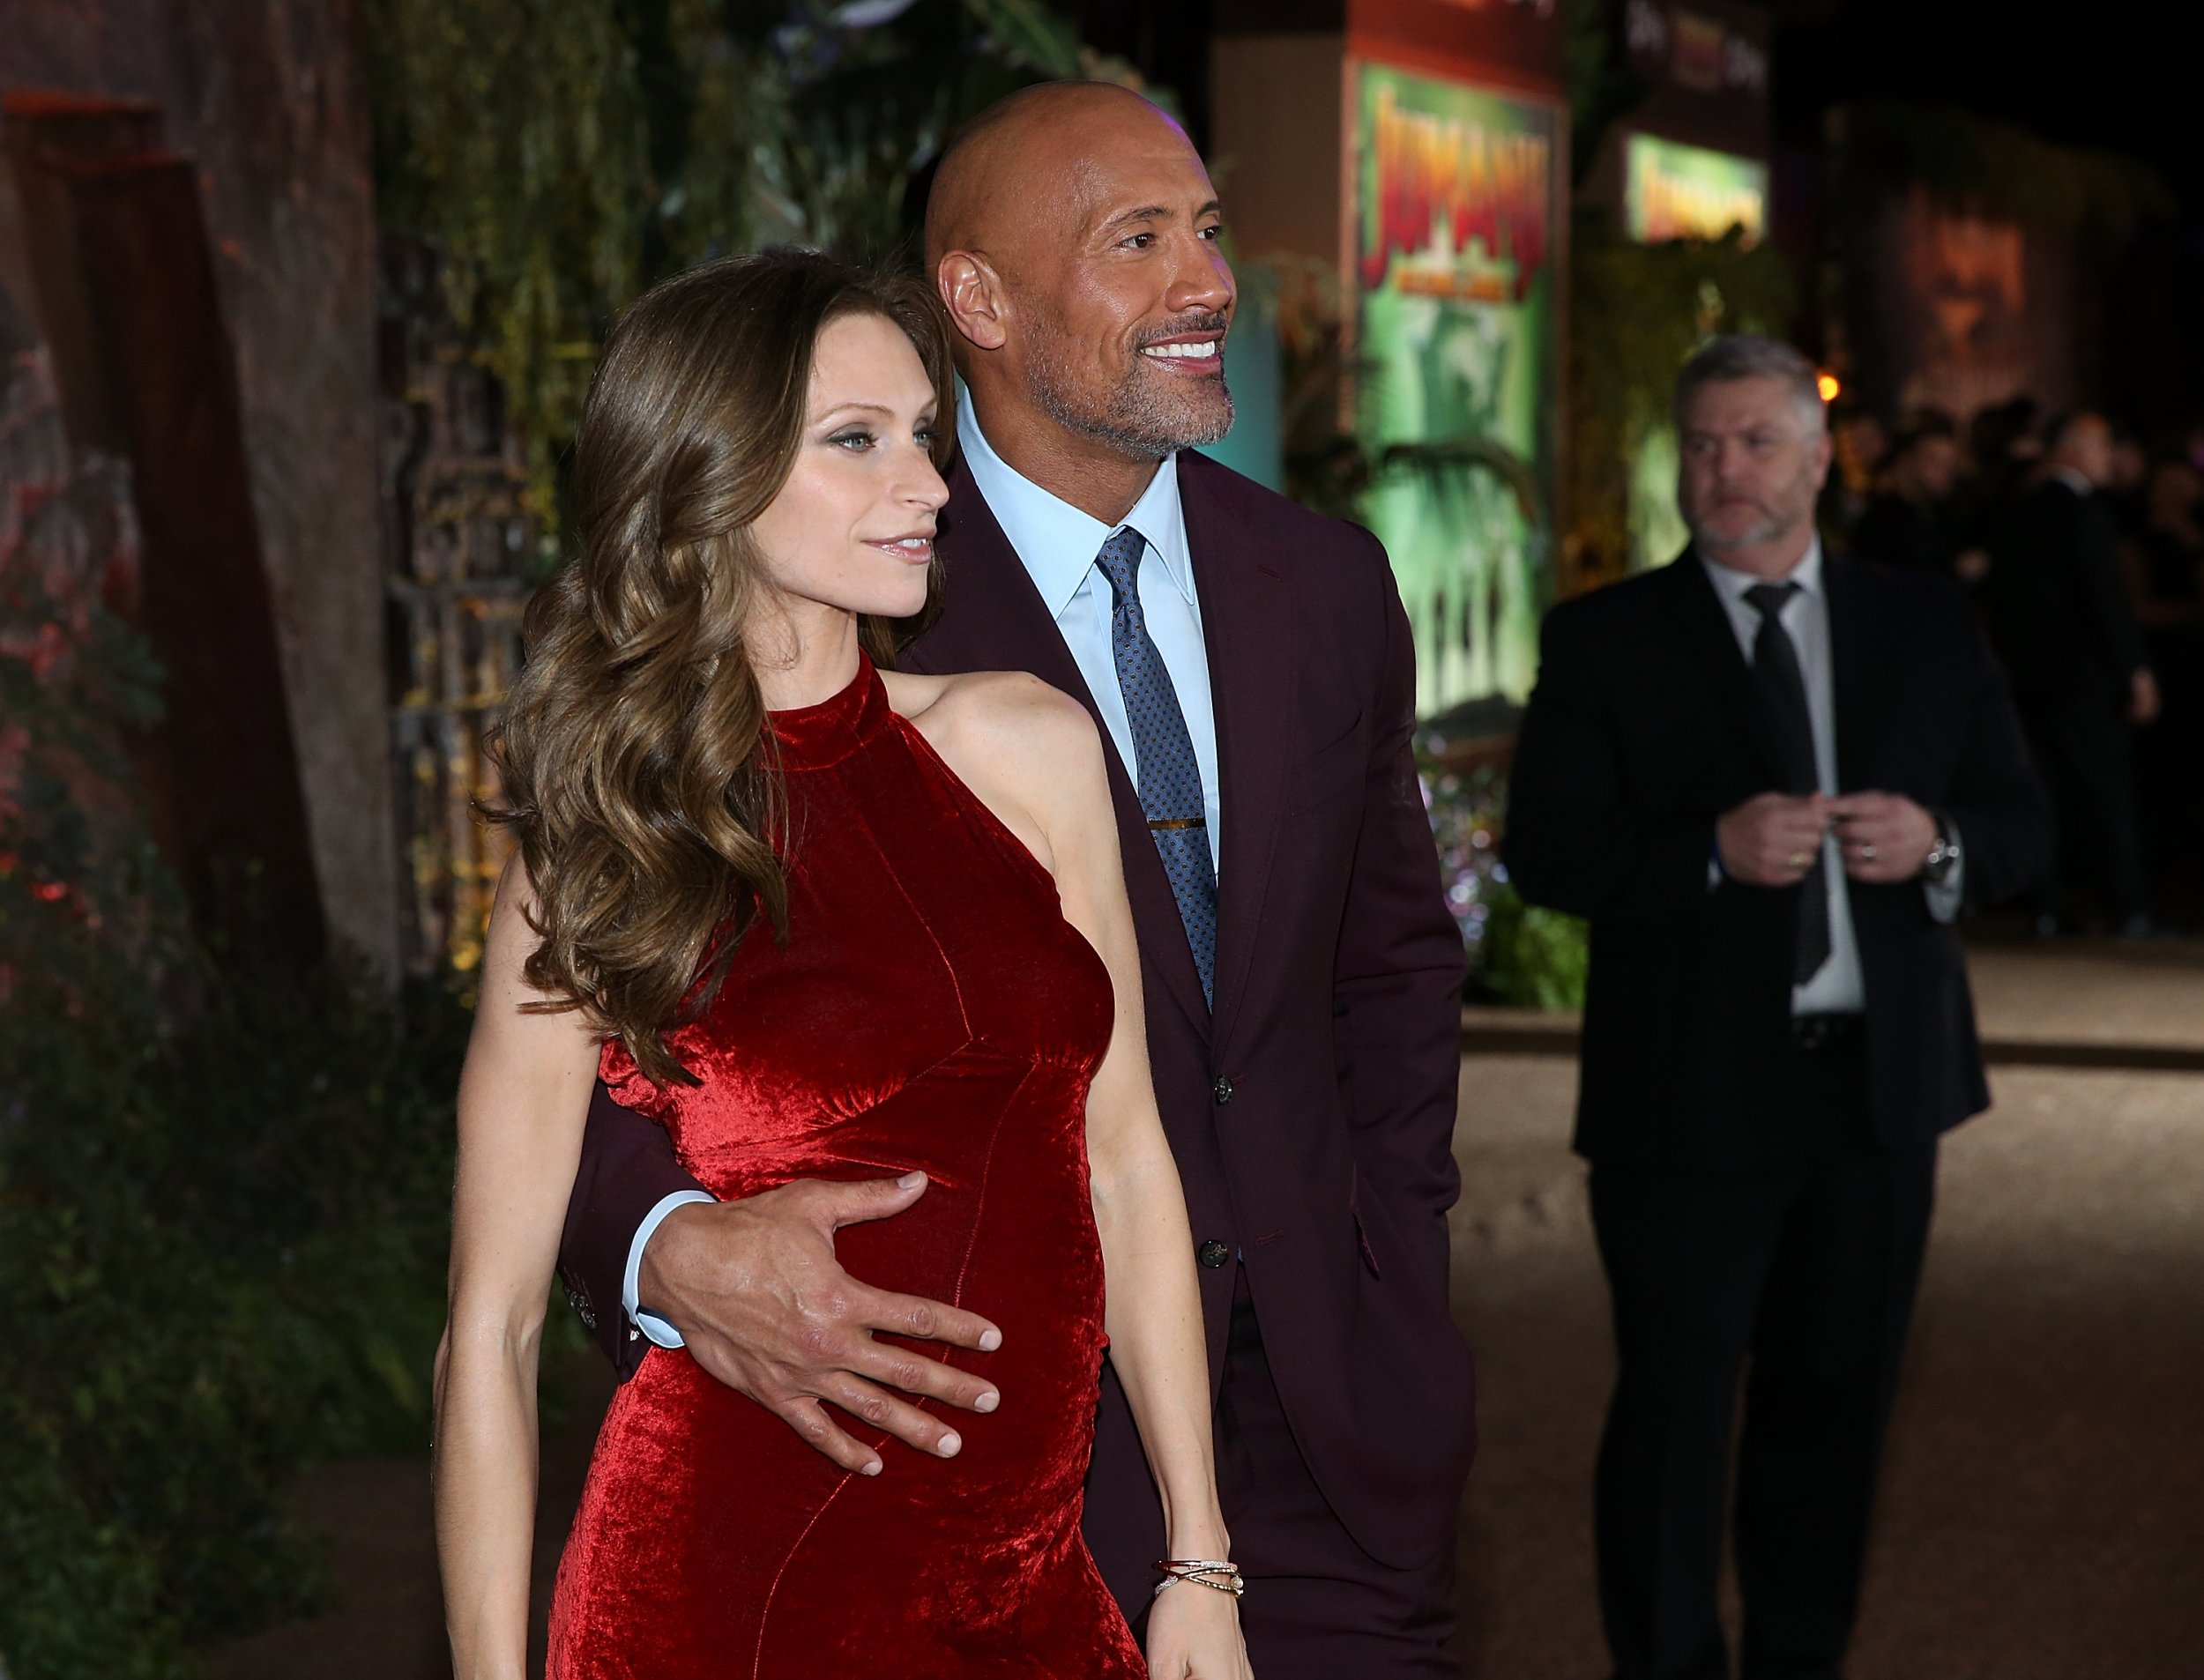 Dwayne Johnson and pregnant girlfriend Lauren Hashian